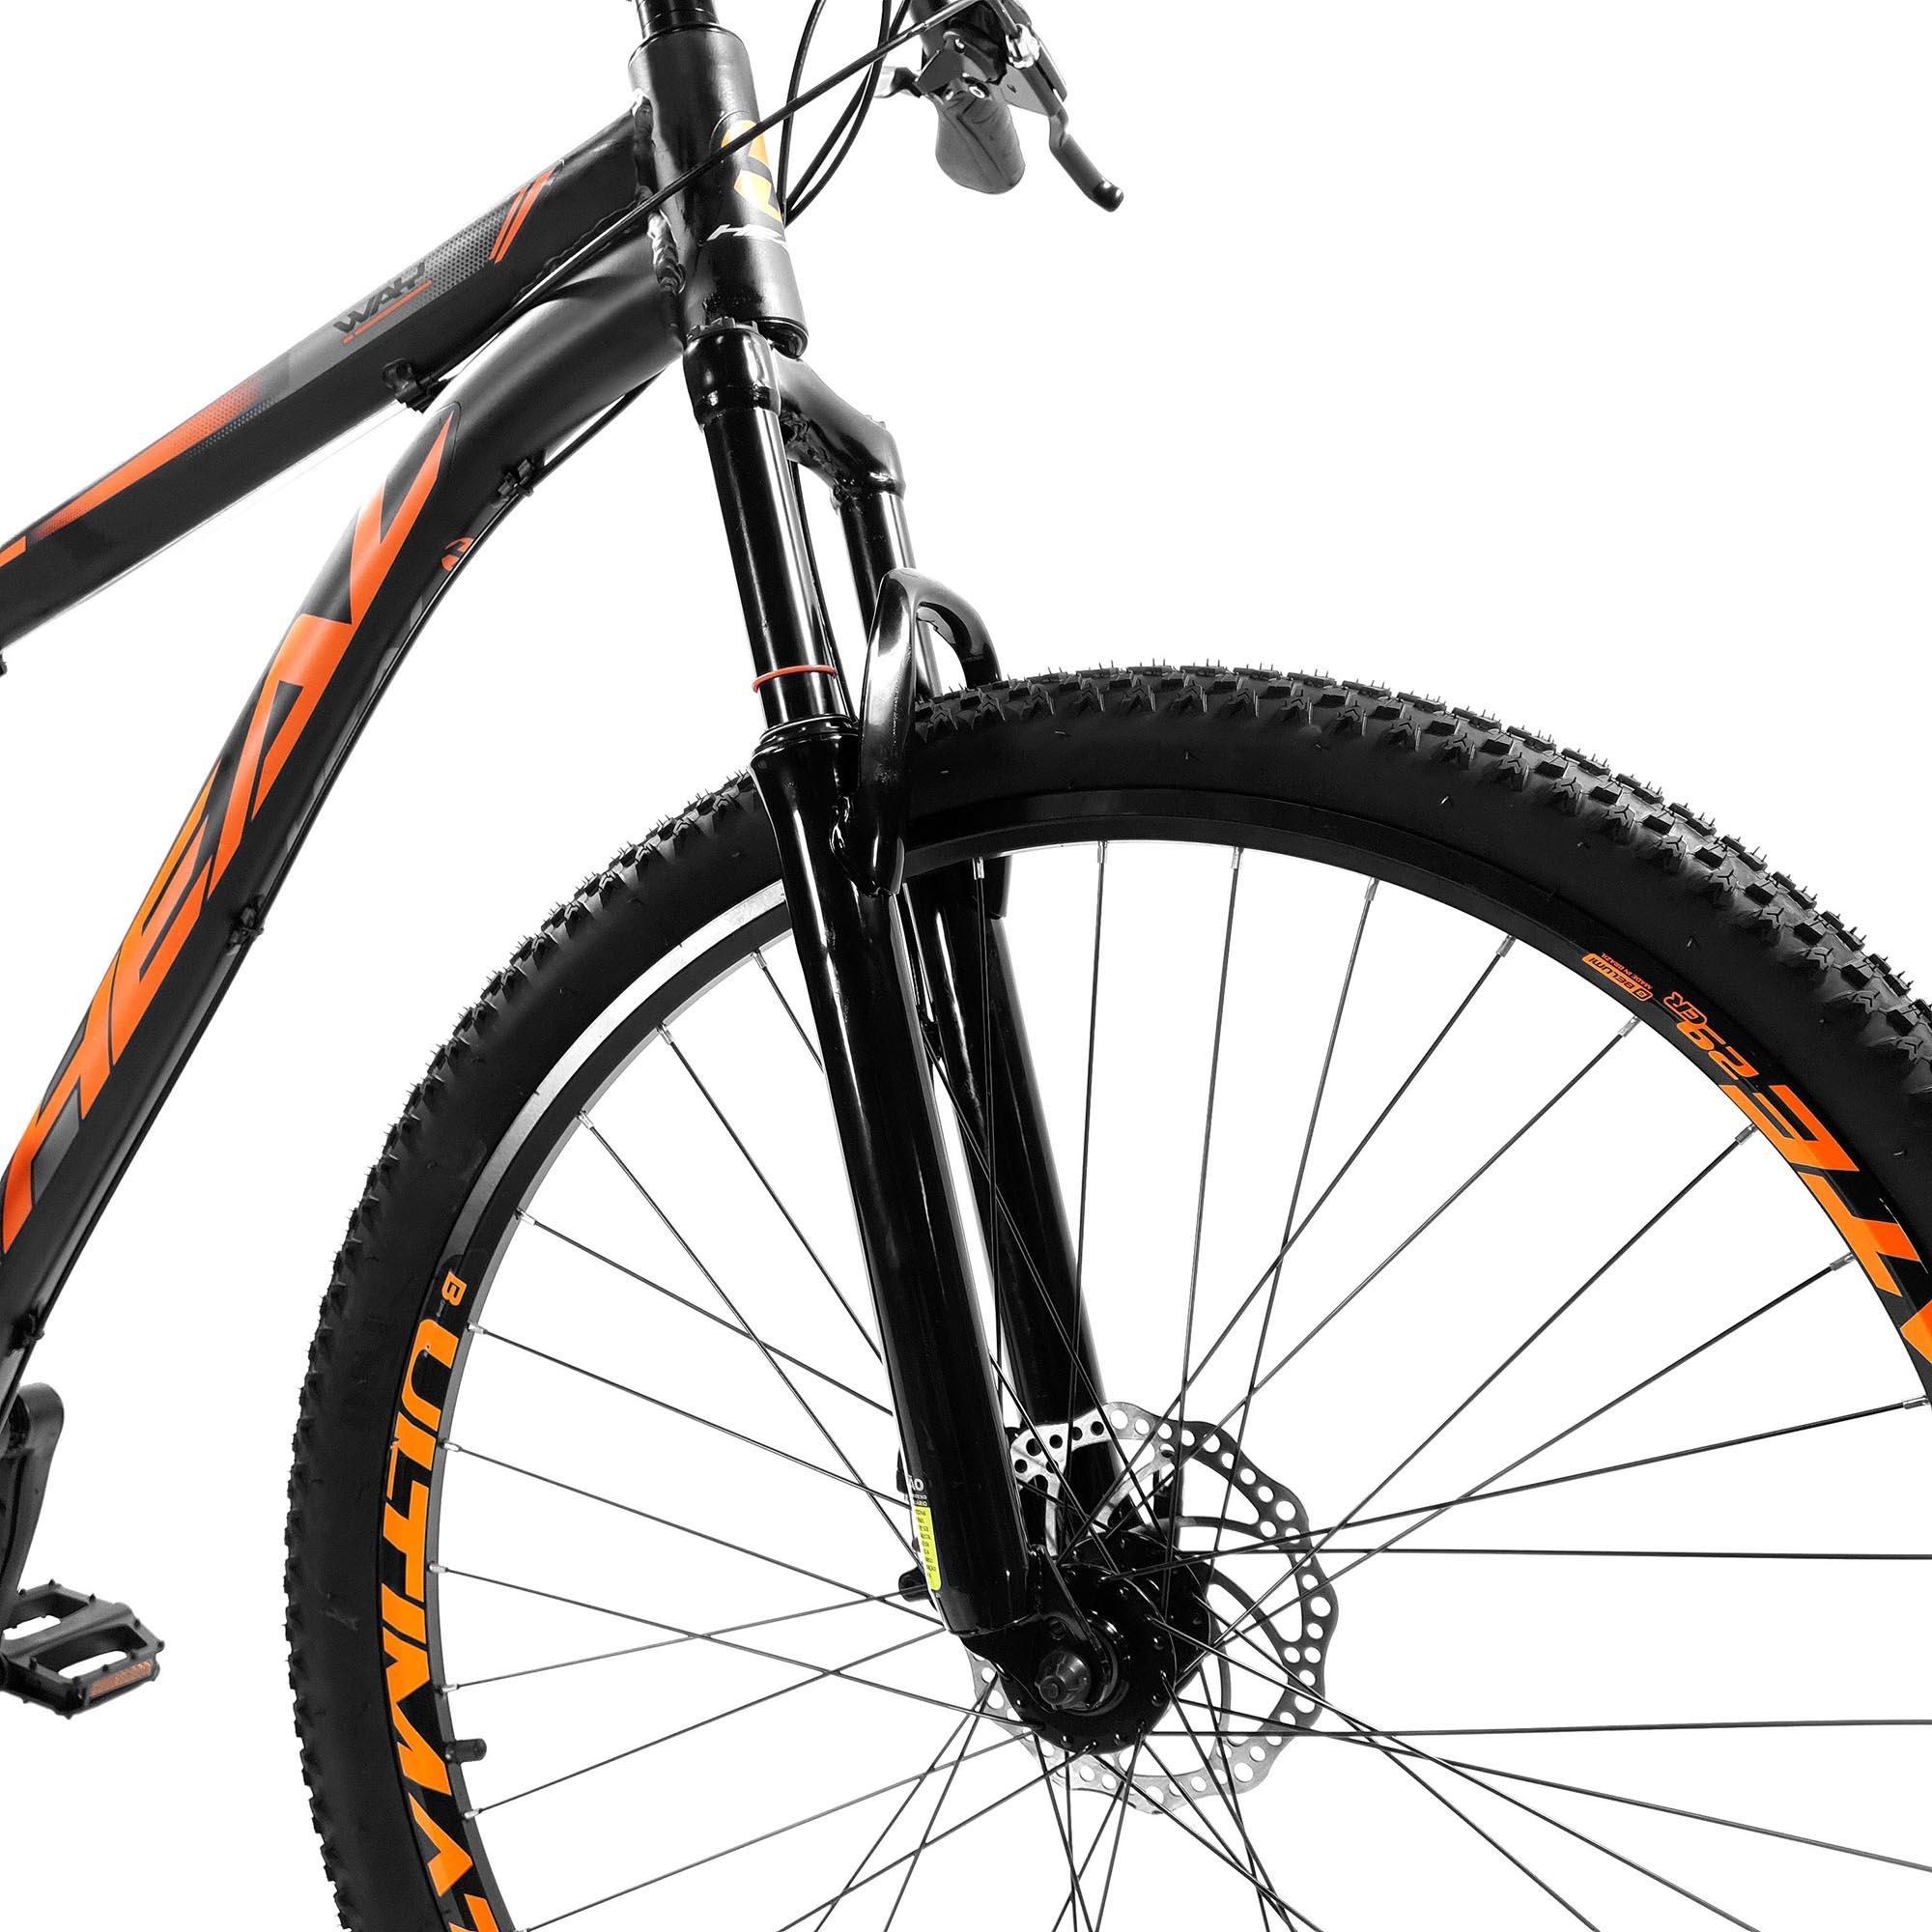 Bicicleta Aro 29 Heal Way, Bicicleta Mtb, Bicicleta de Marcha